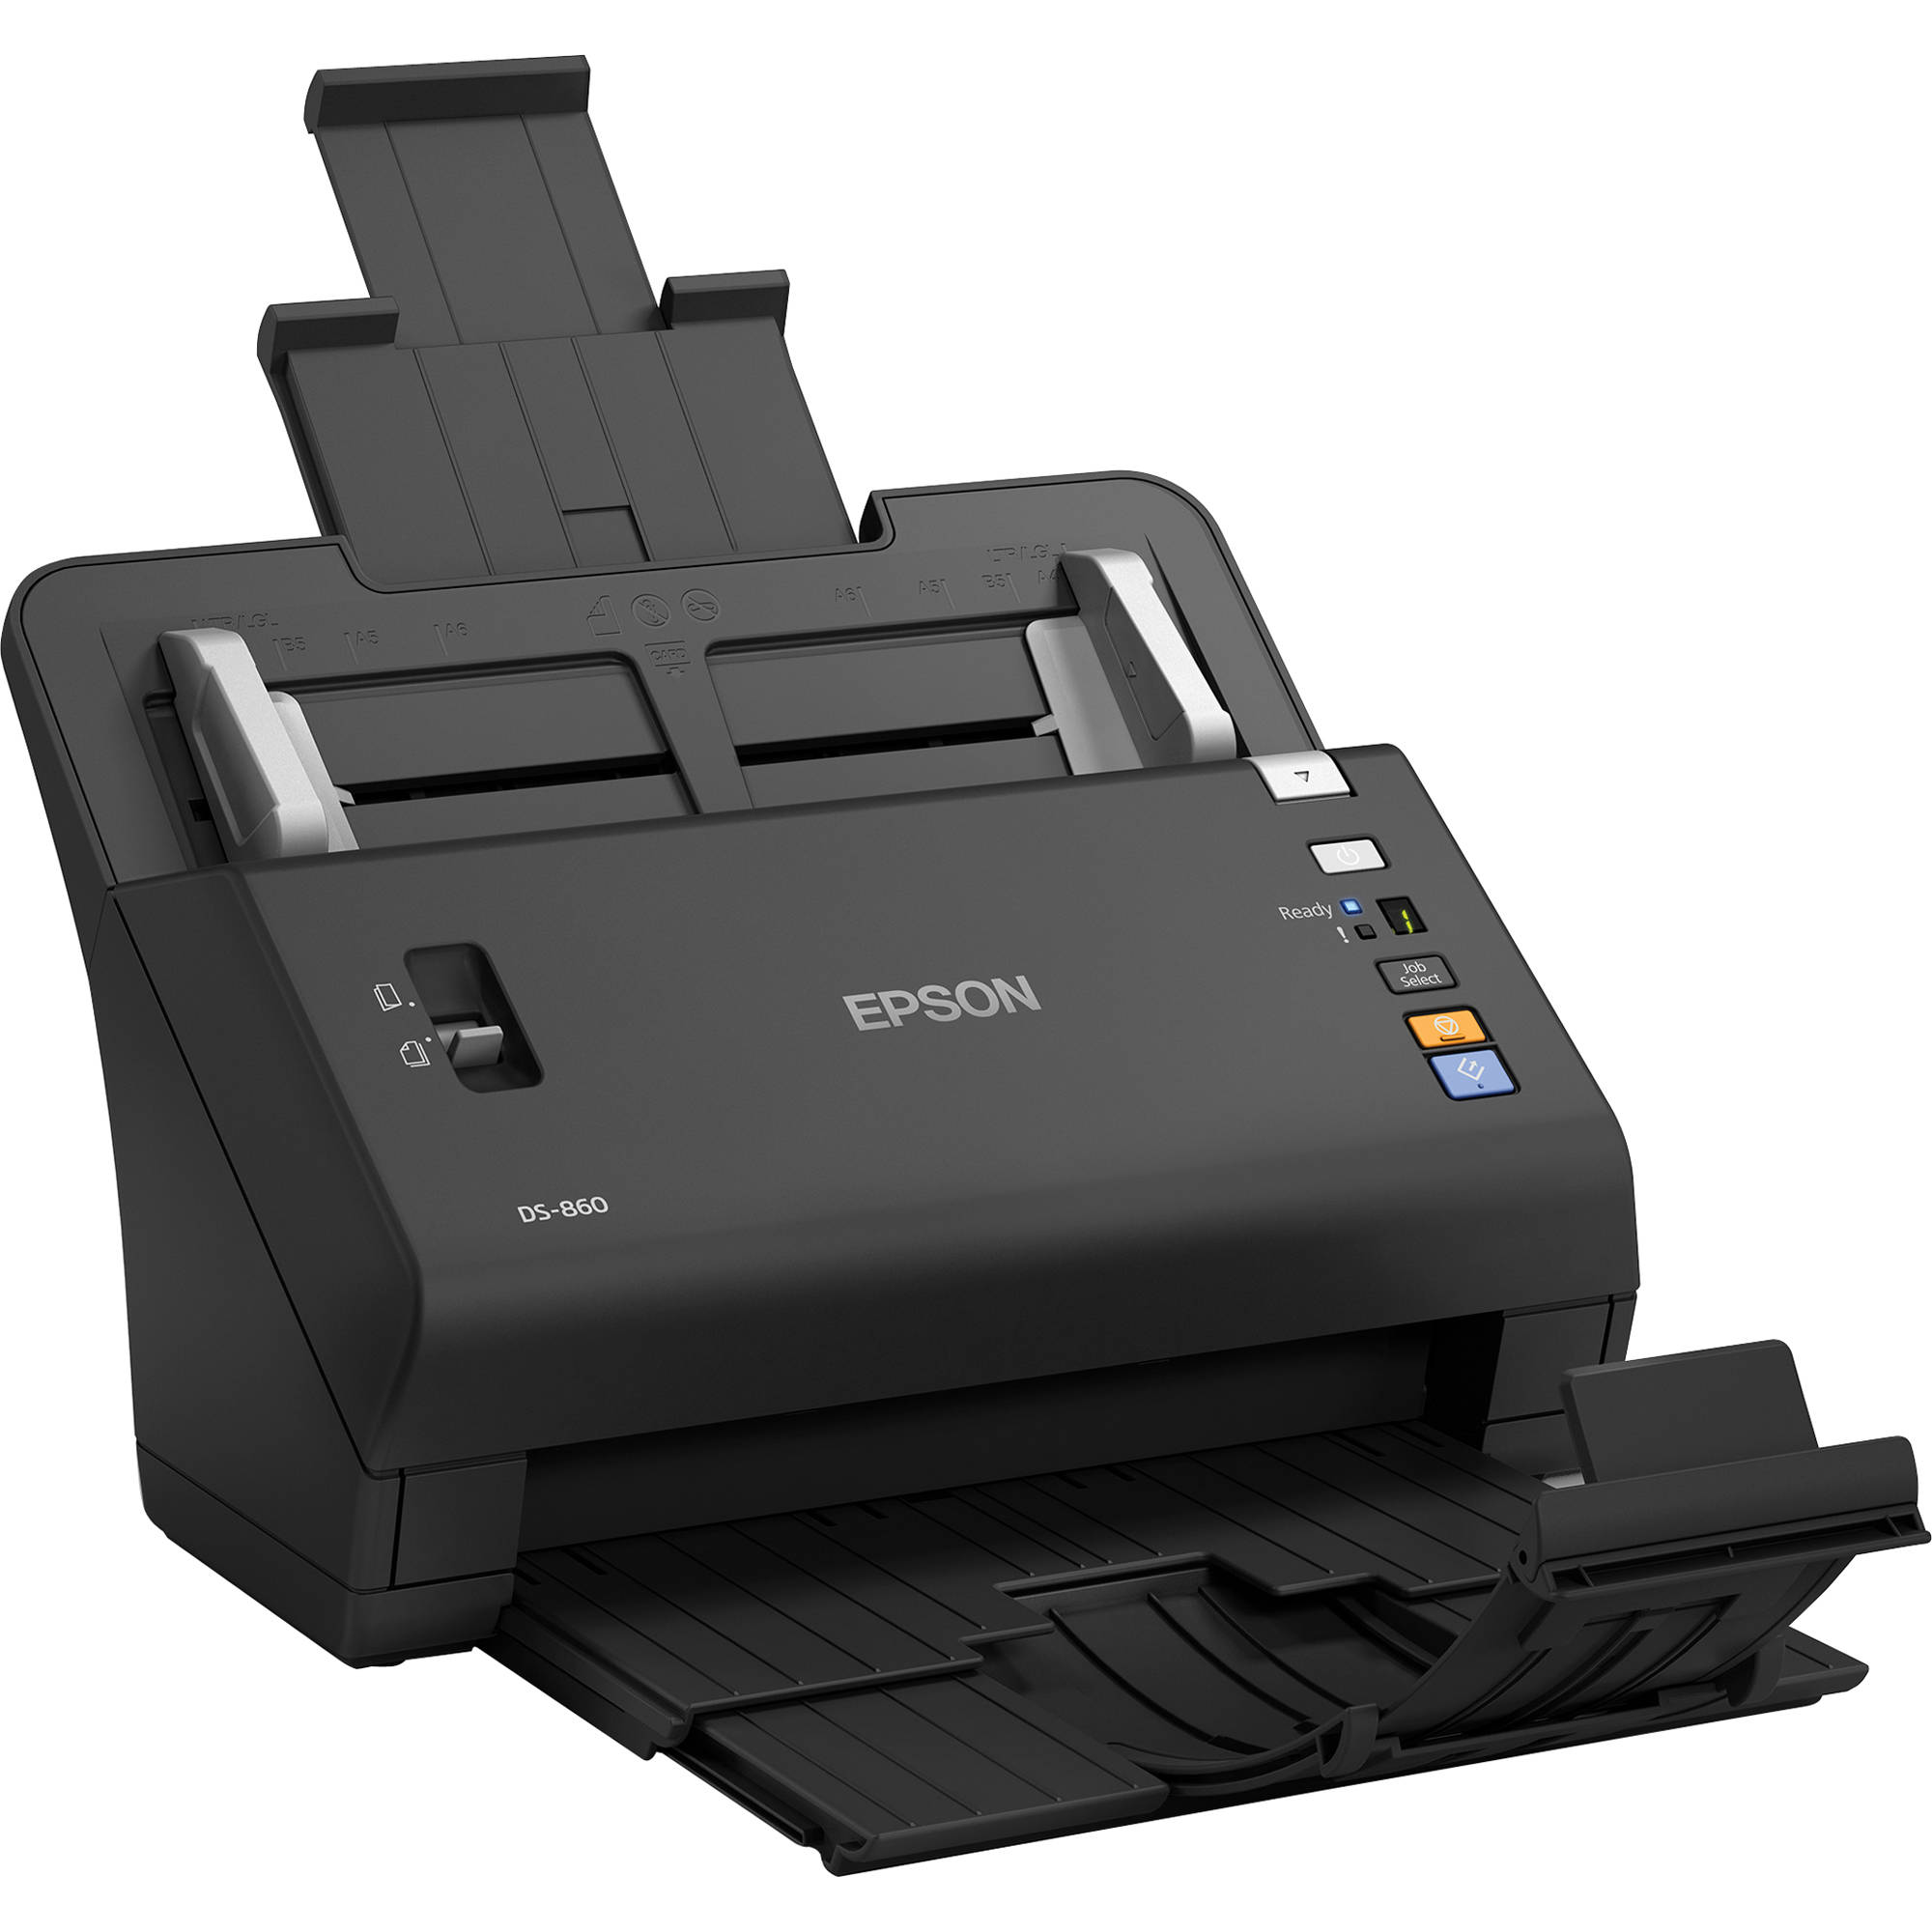 epson workforce ds 860 color document scanner b11b222201 bh With epson workforce ds 860 color document scanner